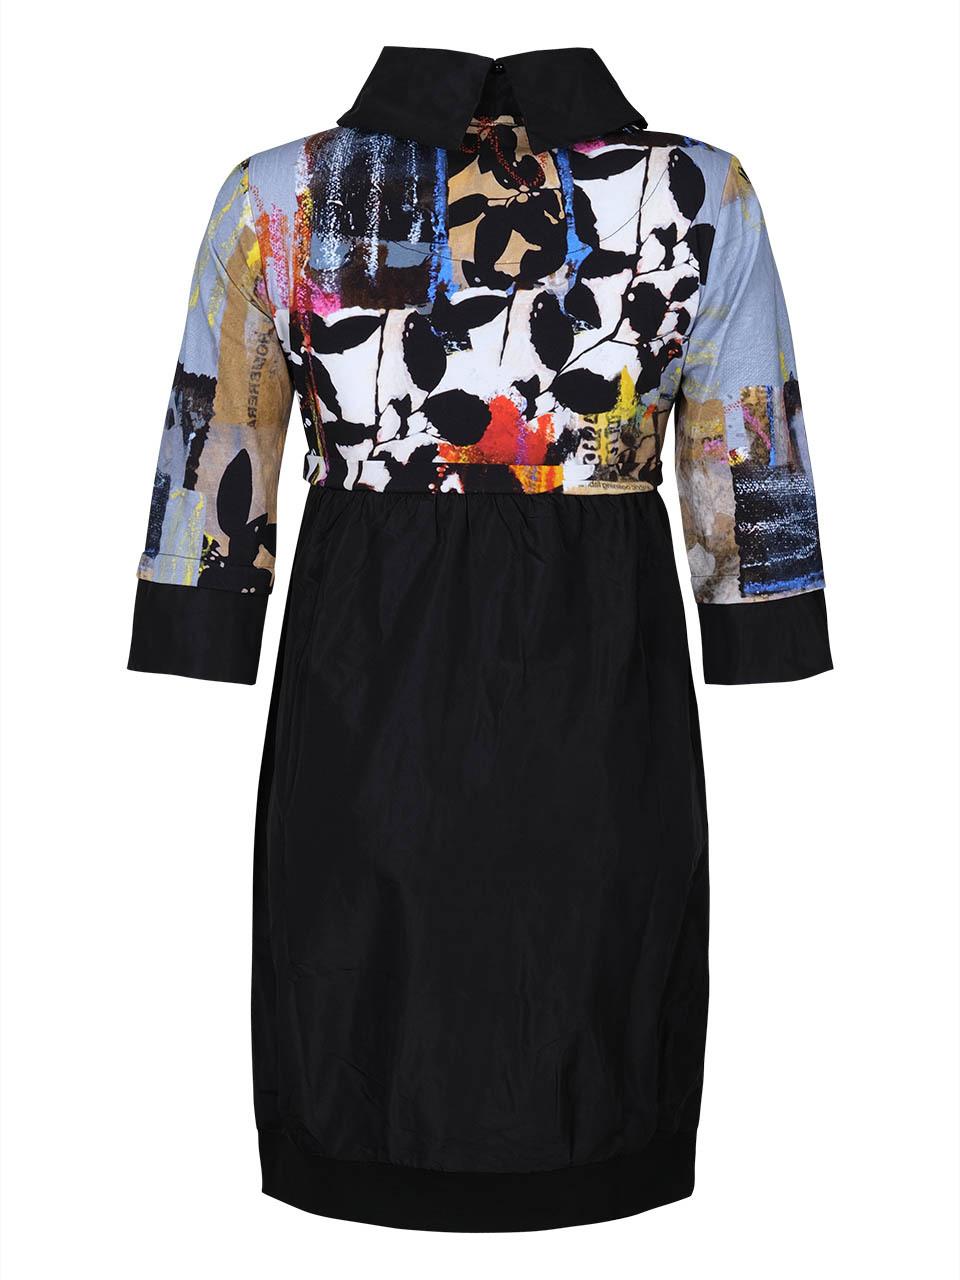 Simply Art Dolcezza: Mixed Media Double OO Abstract Art Midi Dress (3 Left!)